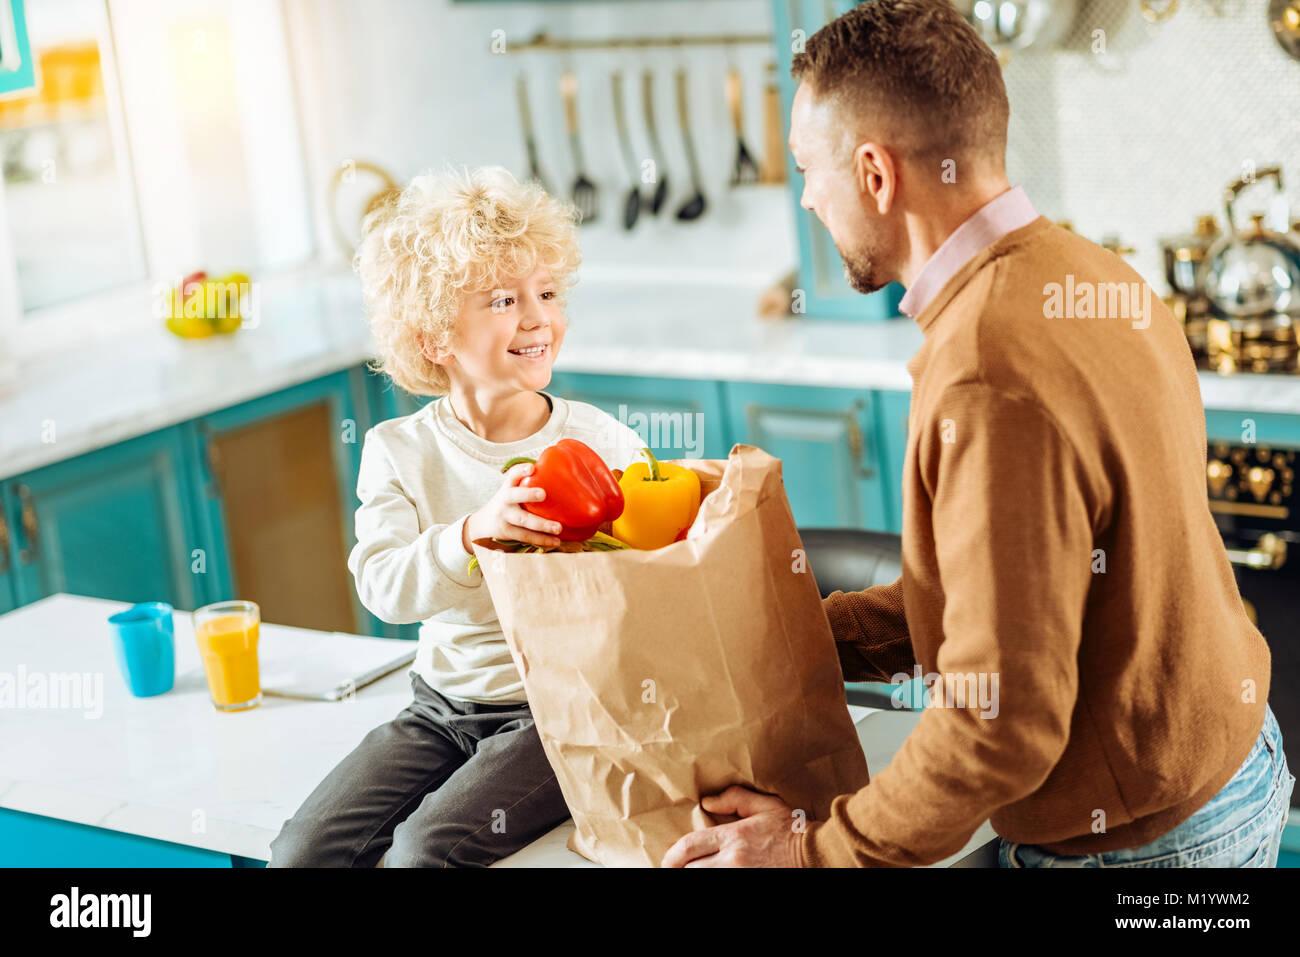 Joyful nice boy smiling to his father - Stock Image